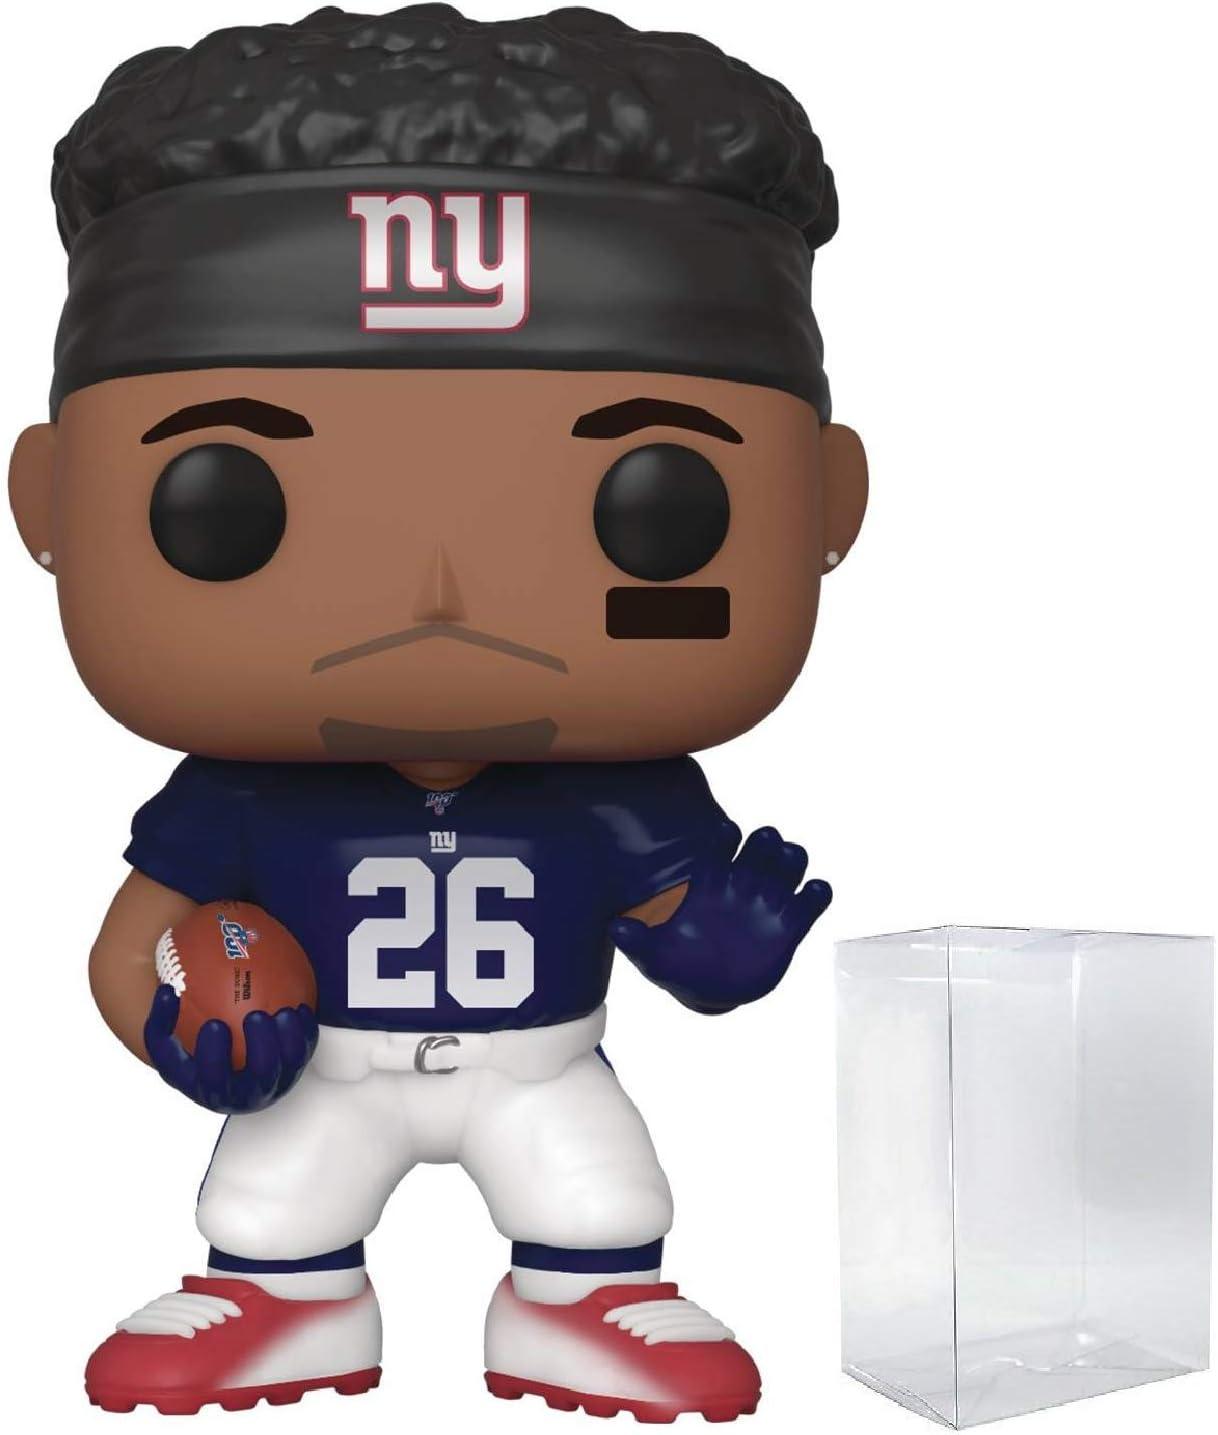 Pop NFL: New York Giants - Saquon Barkley (Home Jersey) Pop! Vinyl Figure (Includes Compatible Pop Box Protector Case)